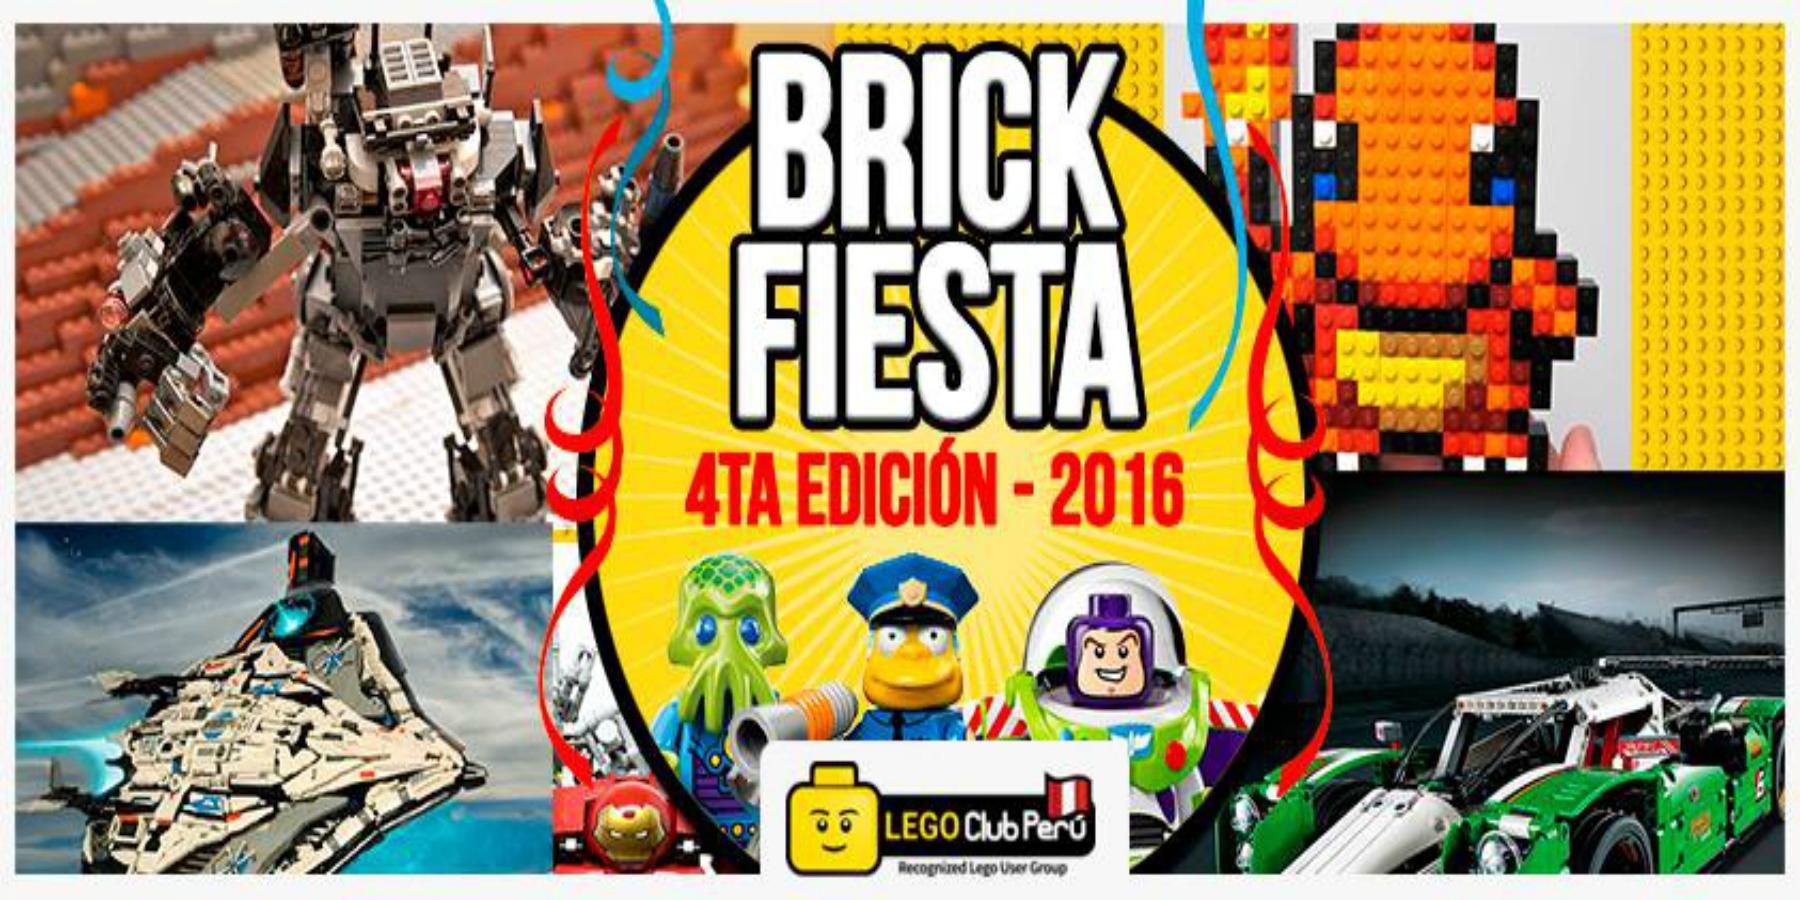 BrickFiesta 4ta edición - 2016